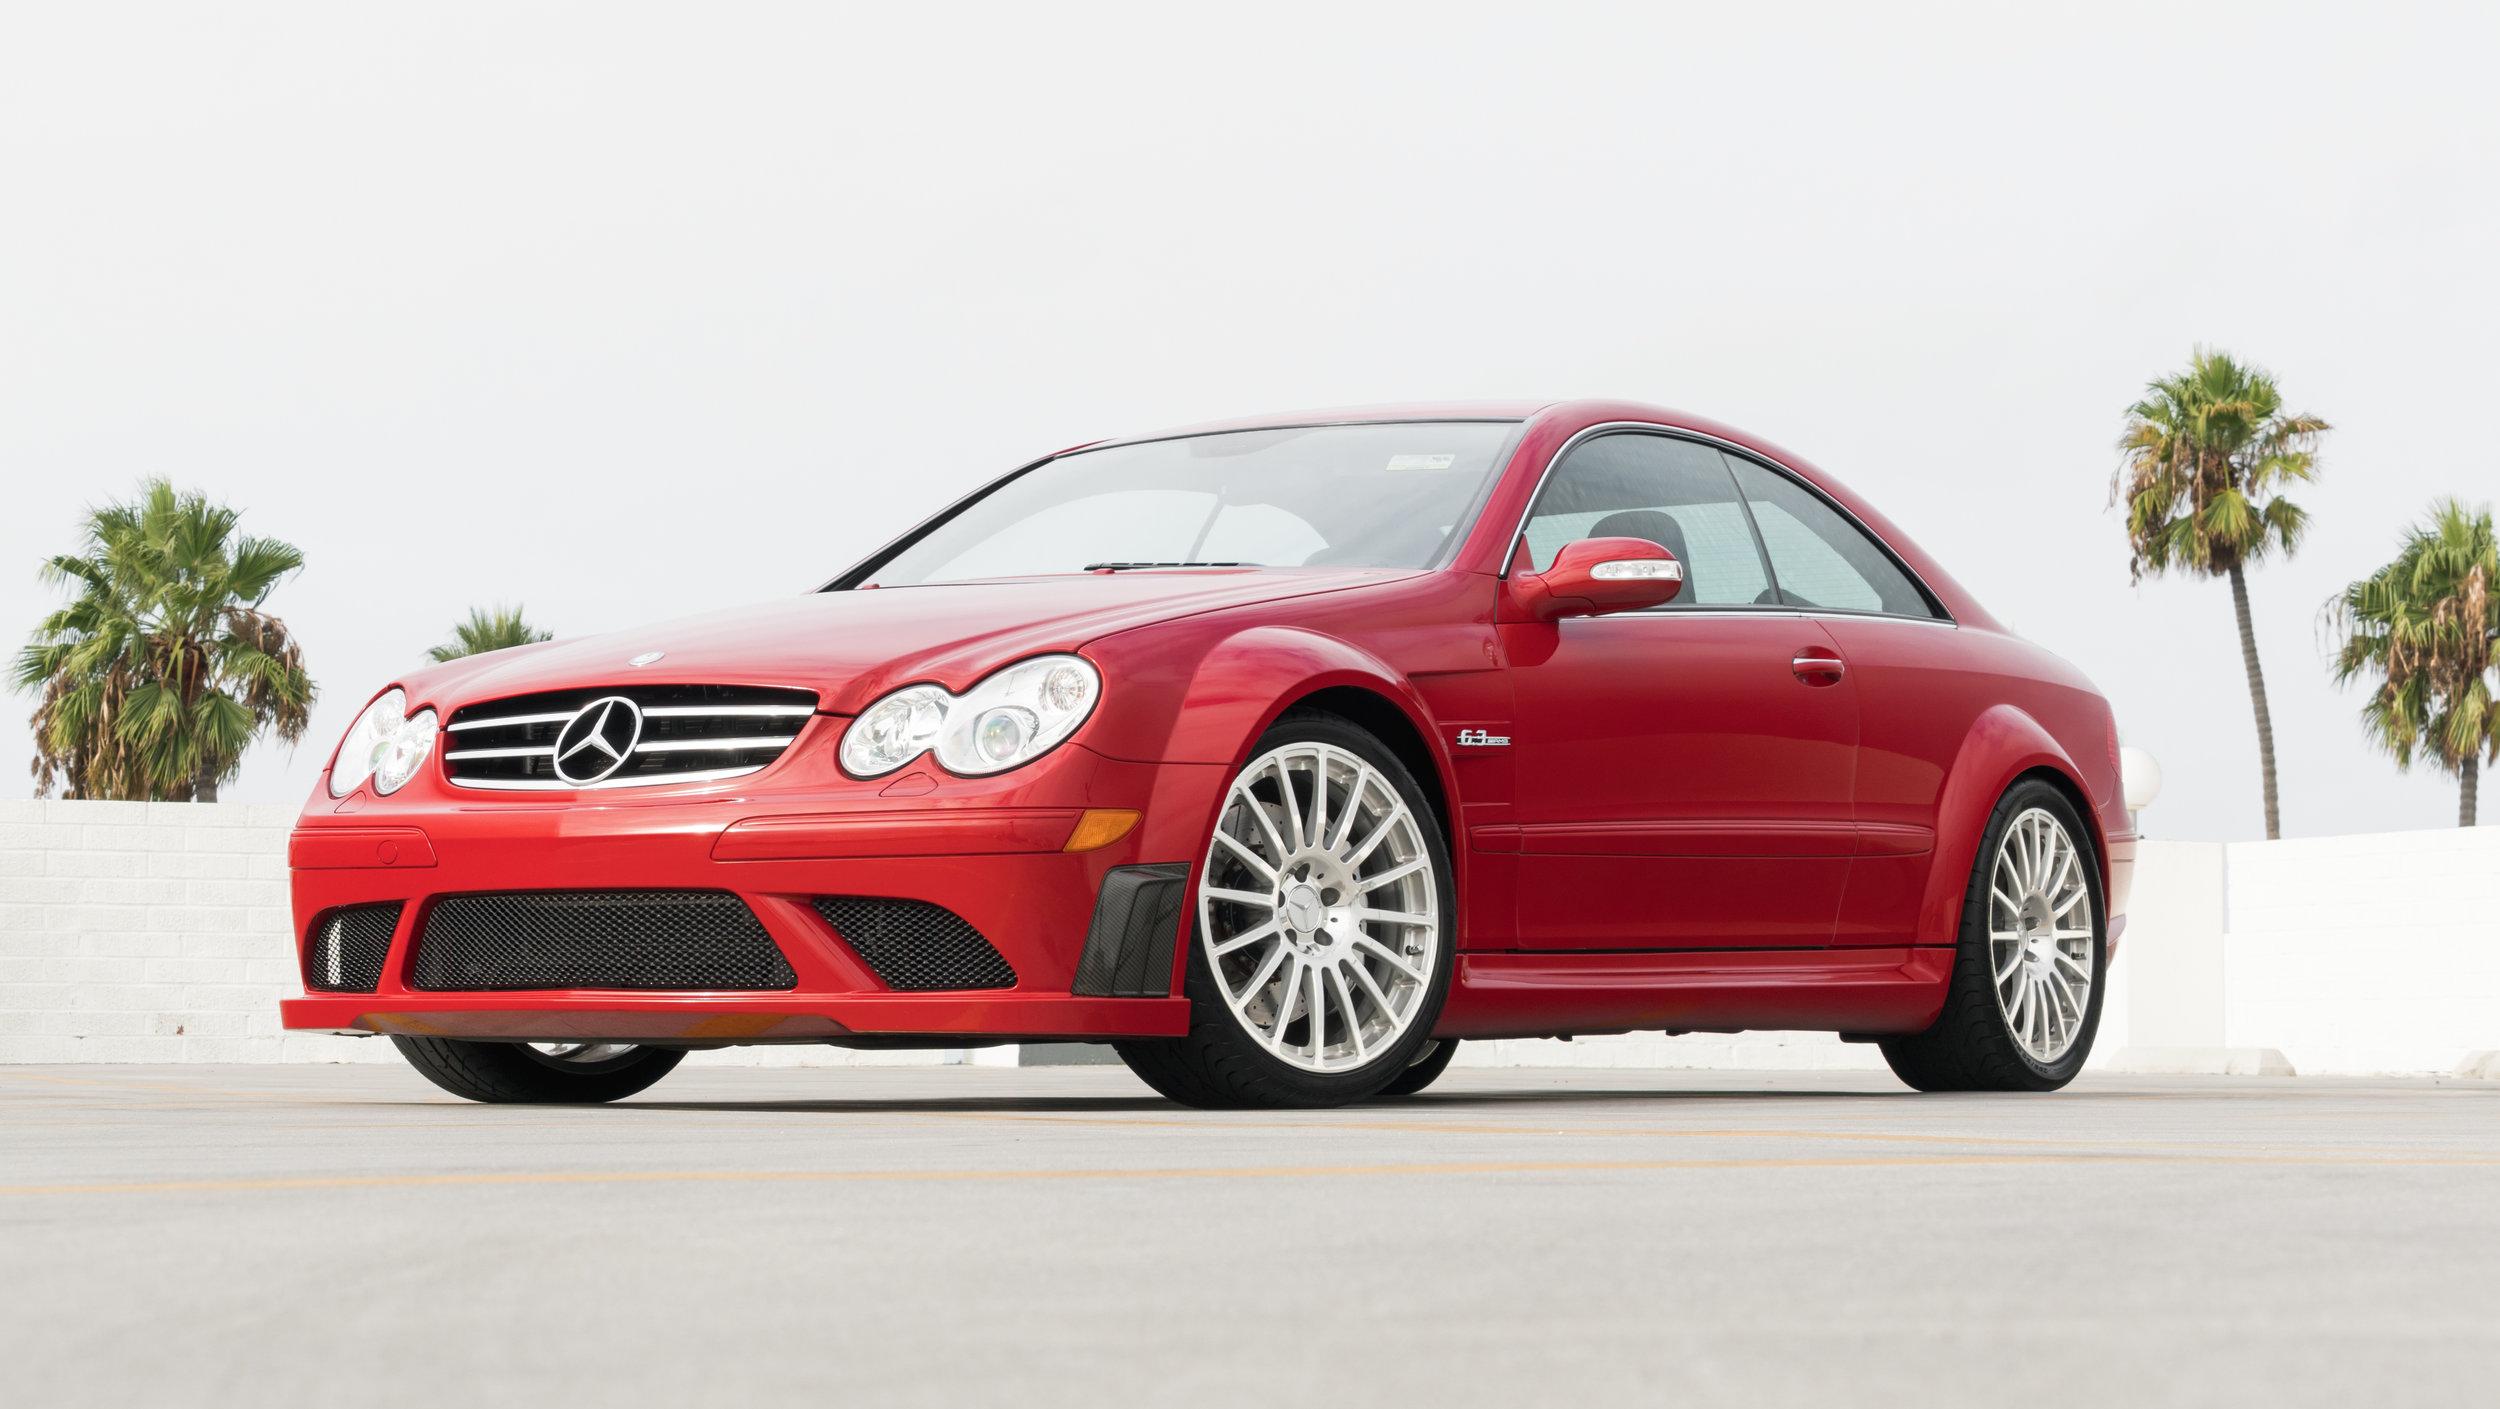 2008 Mercedes Benz CLK63 Black Series Mars Red